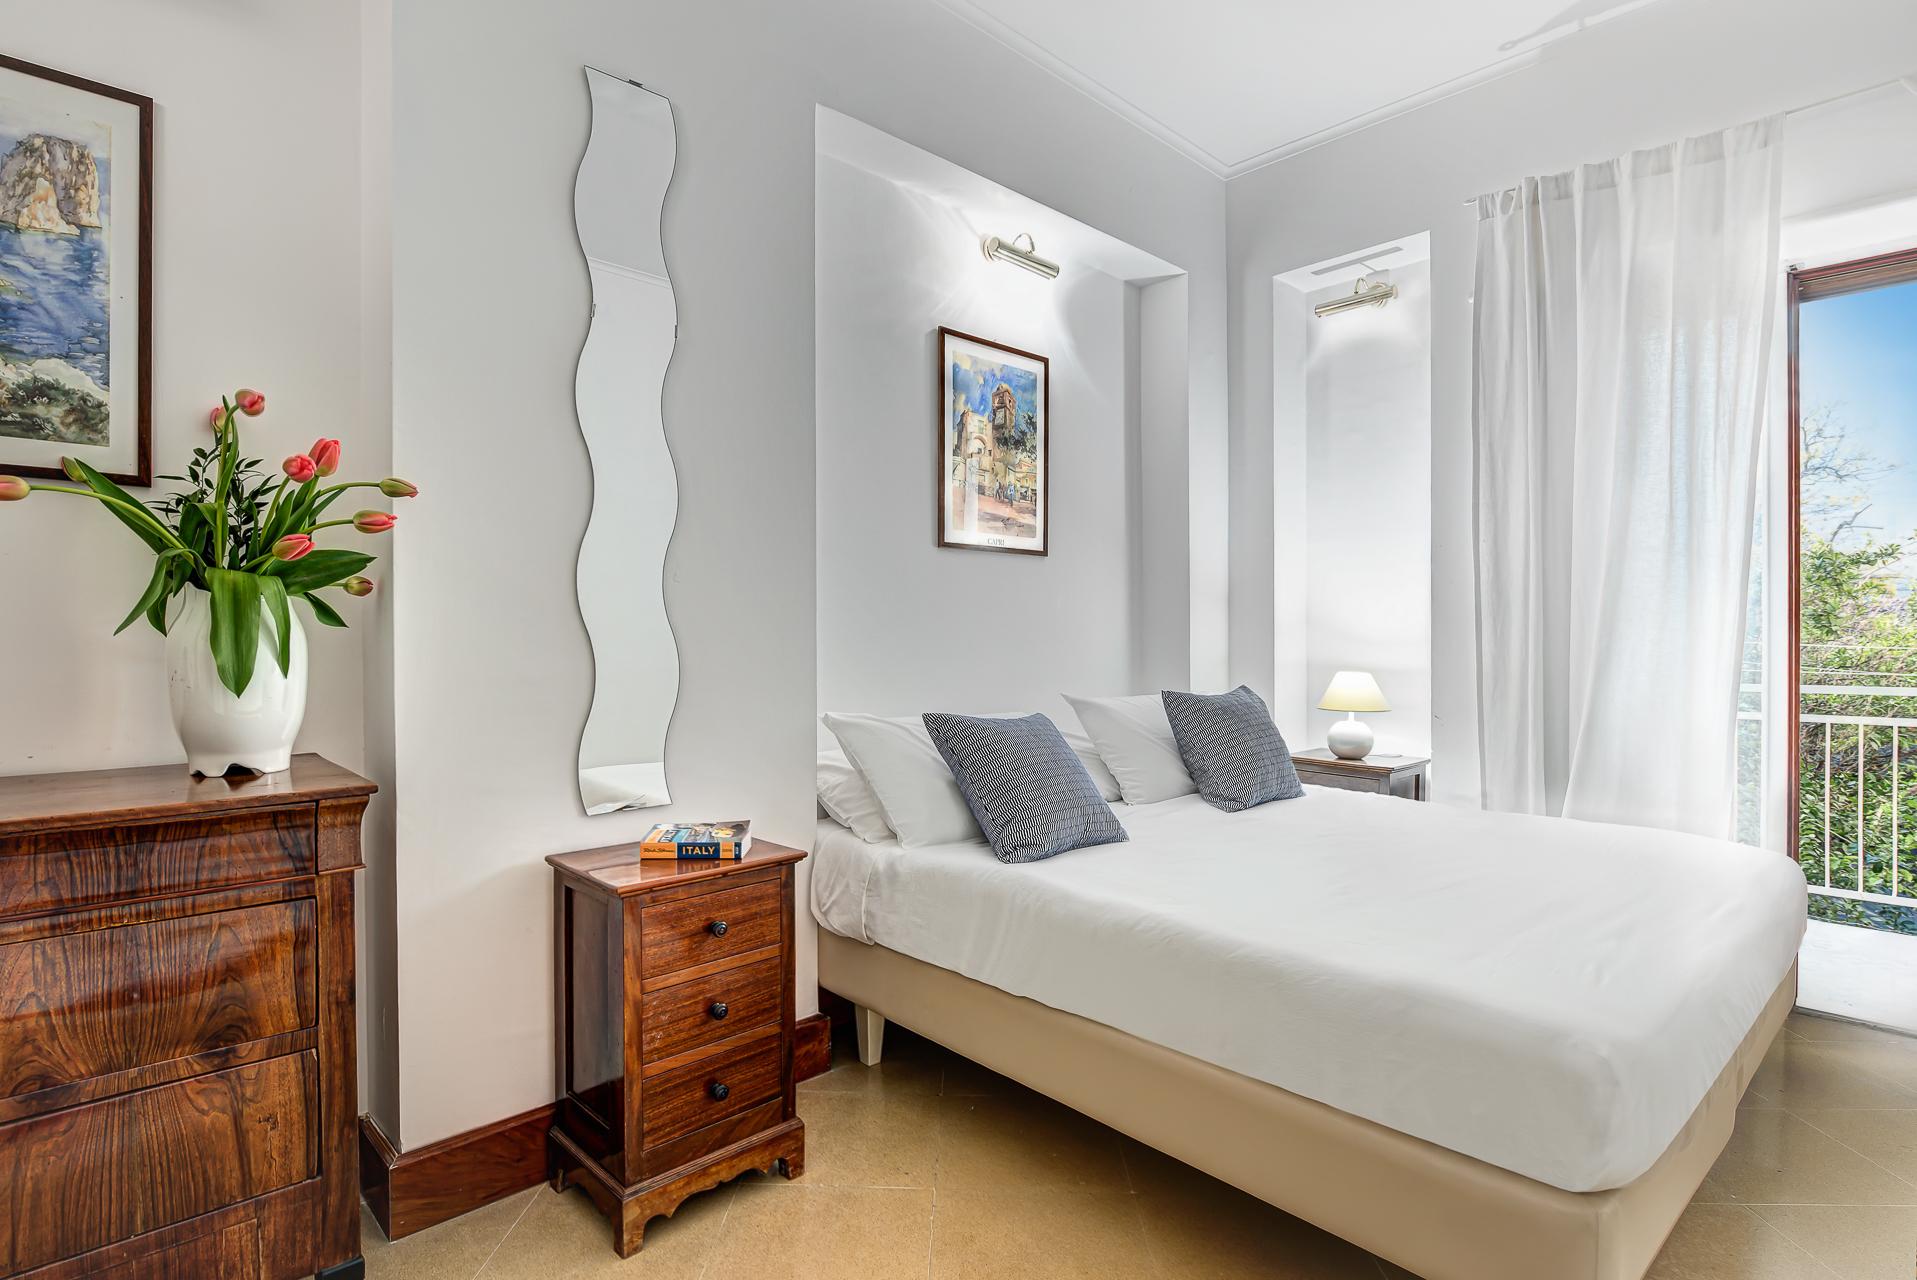 El Royale Suites Sorrento - Gold photo 20410546